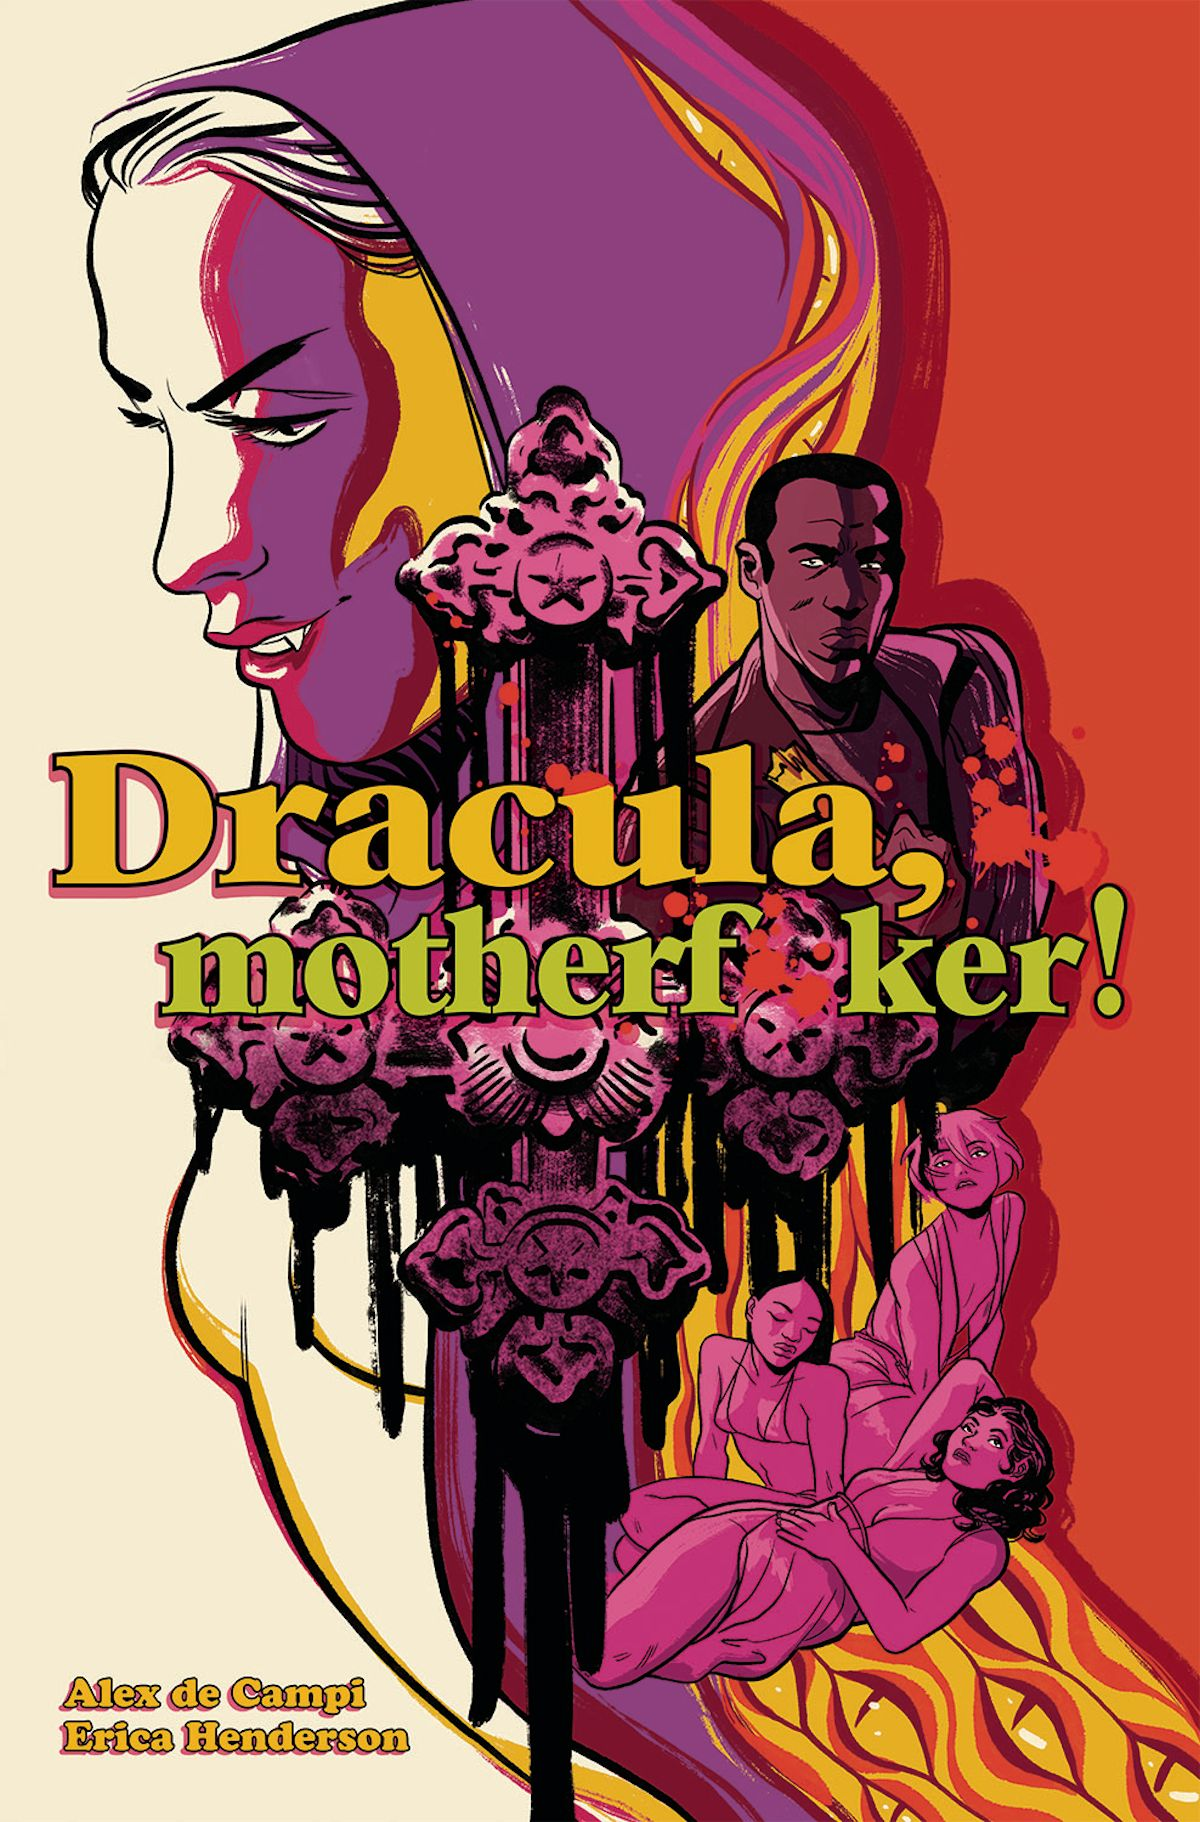 Dracula Motherf**ker